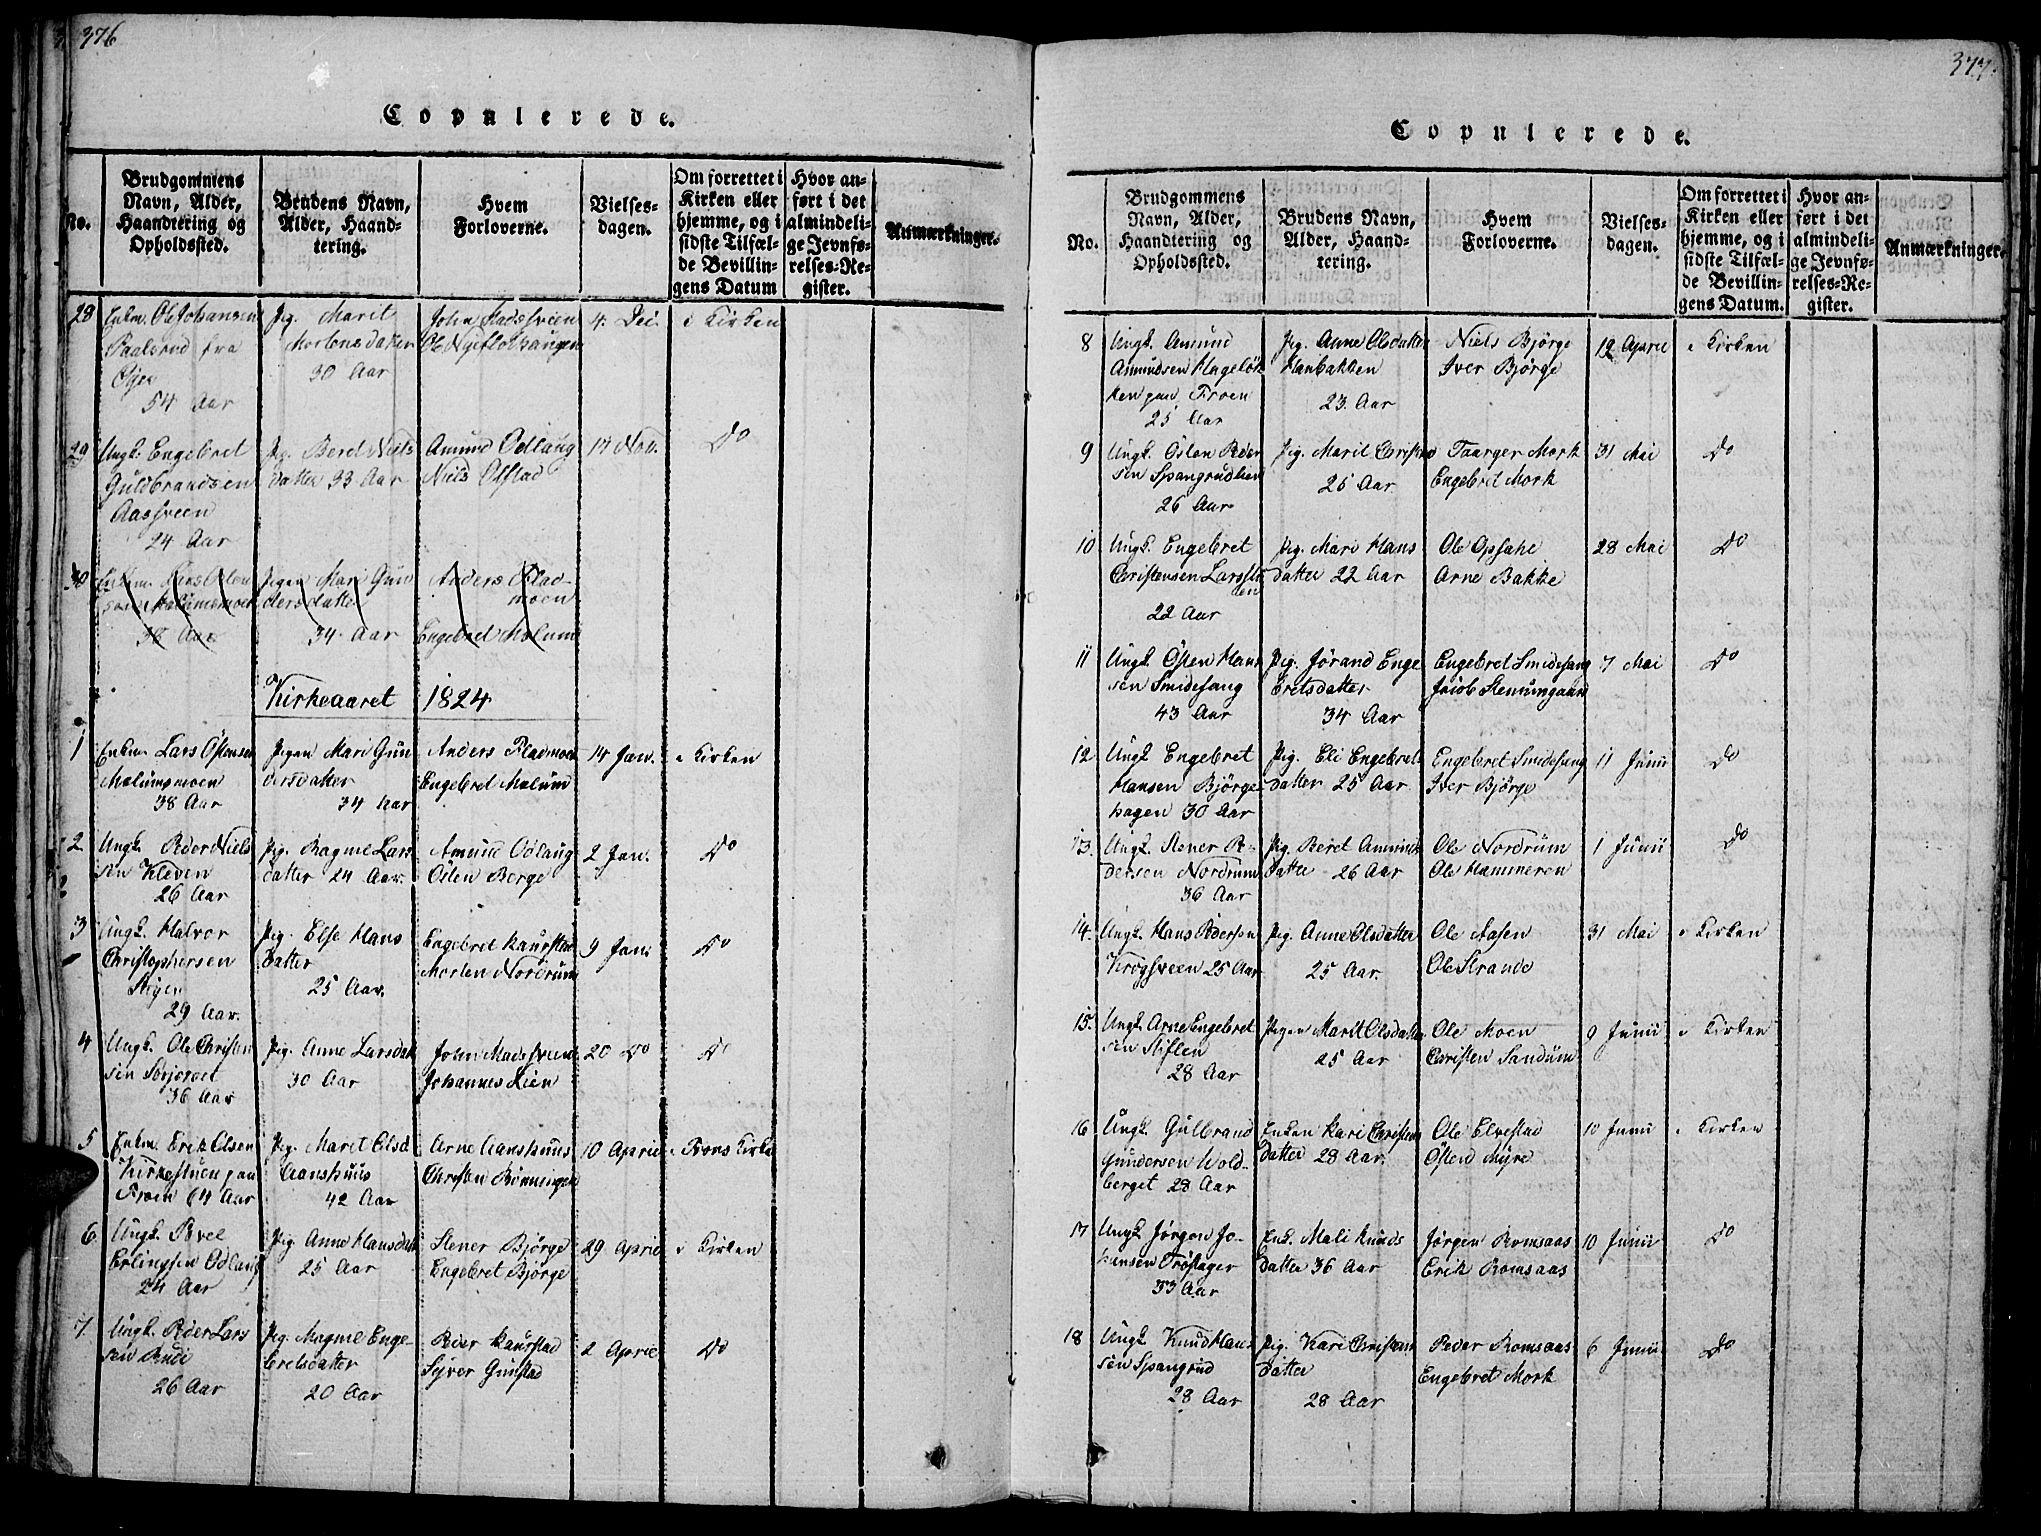 SAH, Ringebu prestekontor, Ministerialbok nr. 4, 1821-1839, s. 376-377